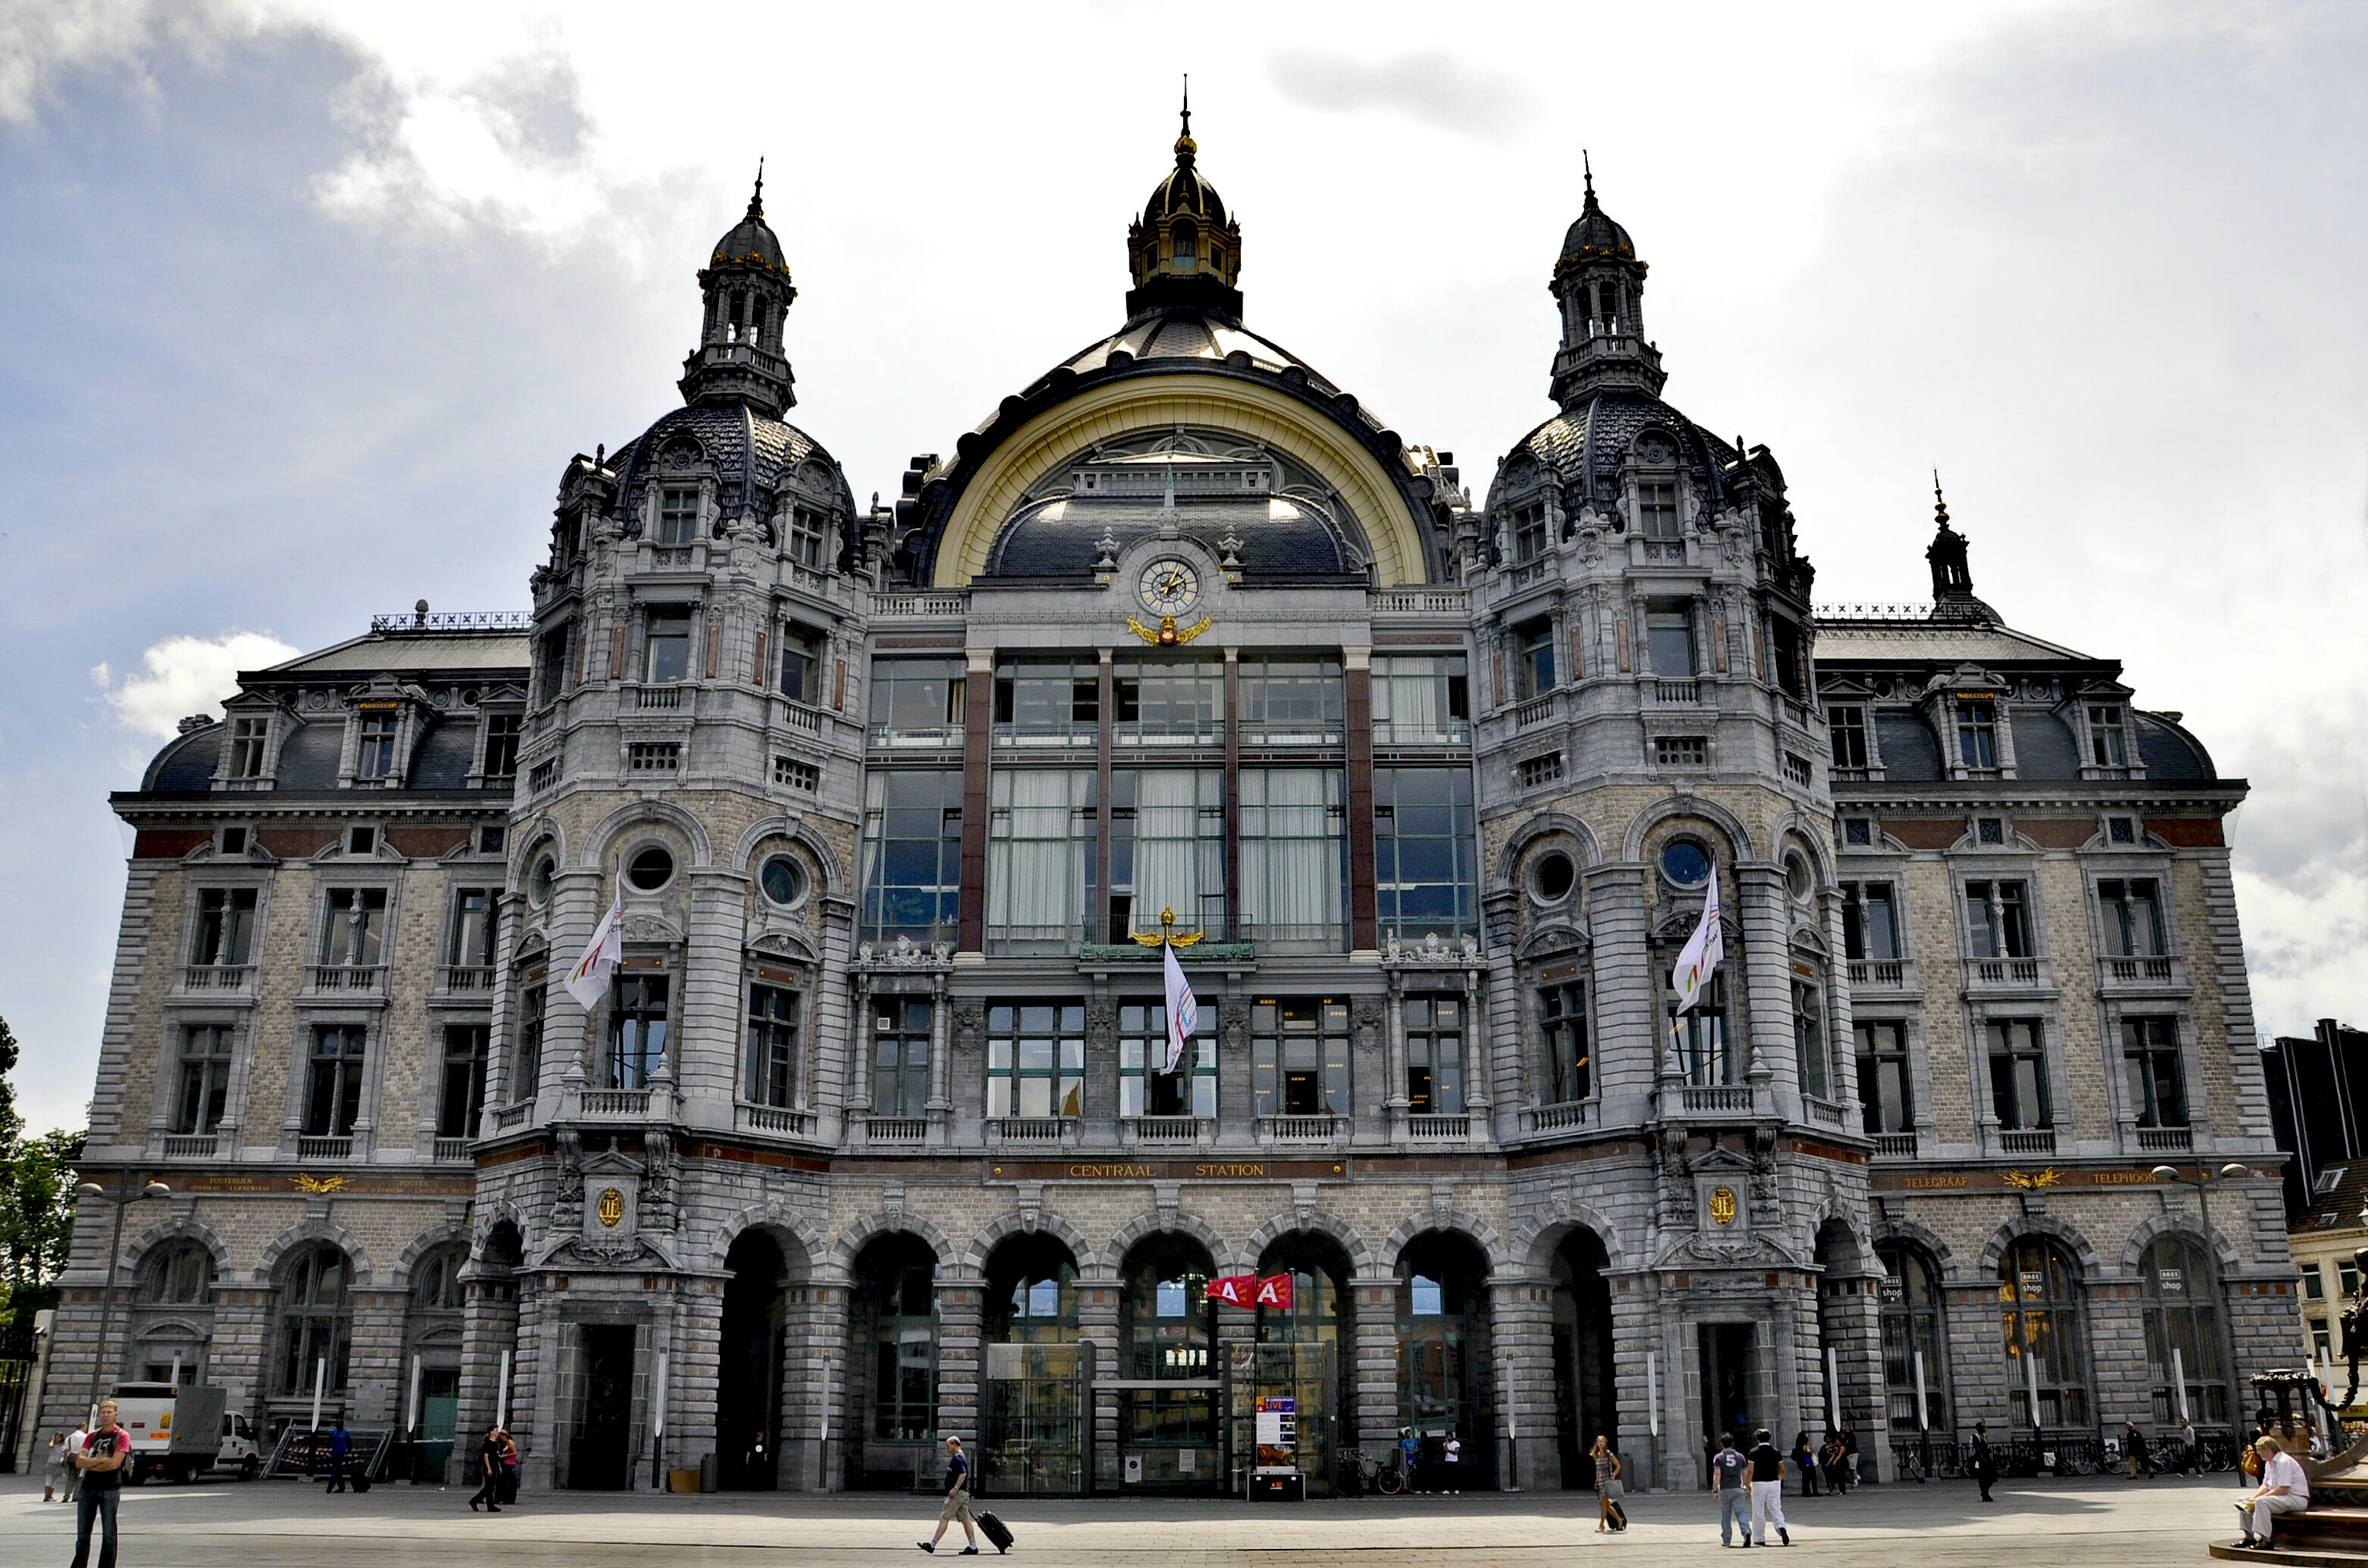 Antwerpen Centraal station 12-07-2010 14-04-17.JPG